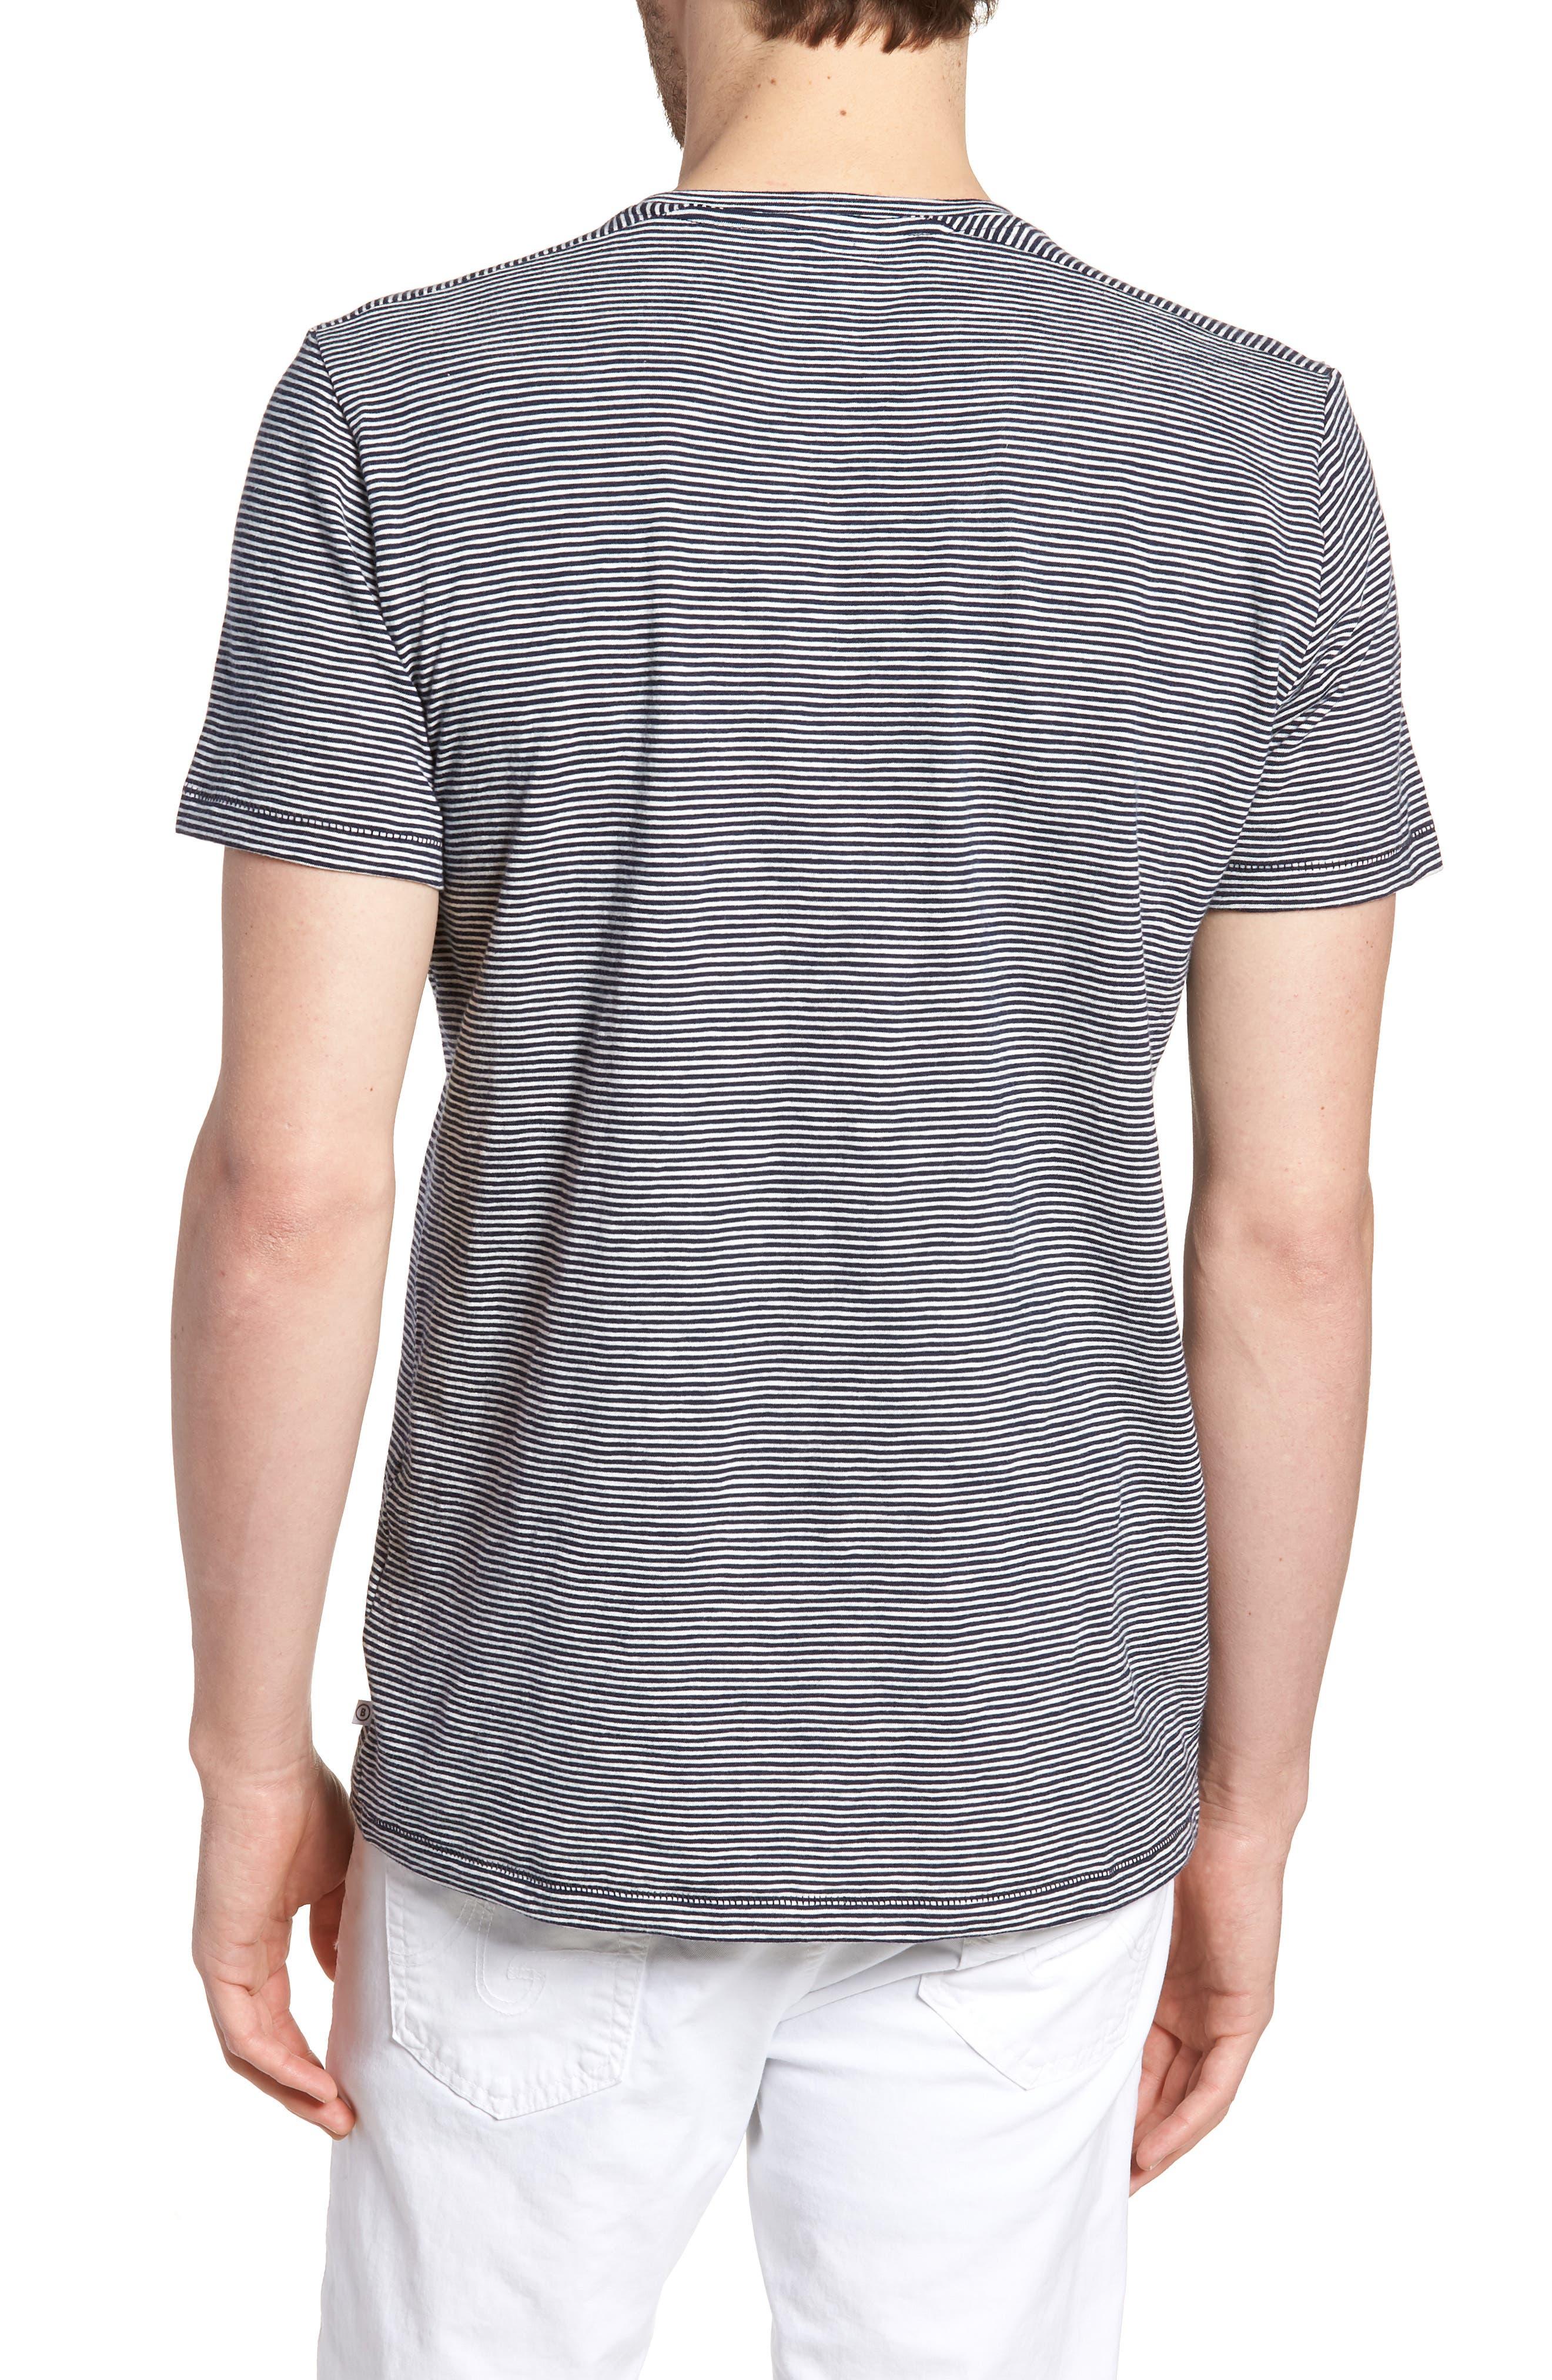 Stripe T-Shirt,                             Alternate thumbnail 2, color,                             Paddleboard Stripe Tee